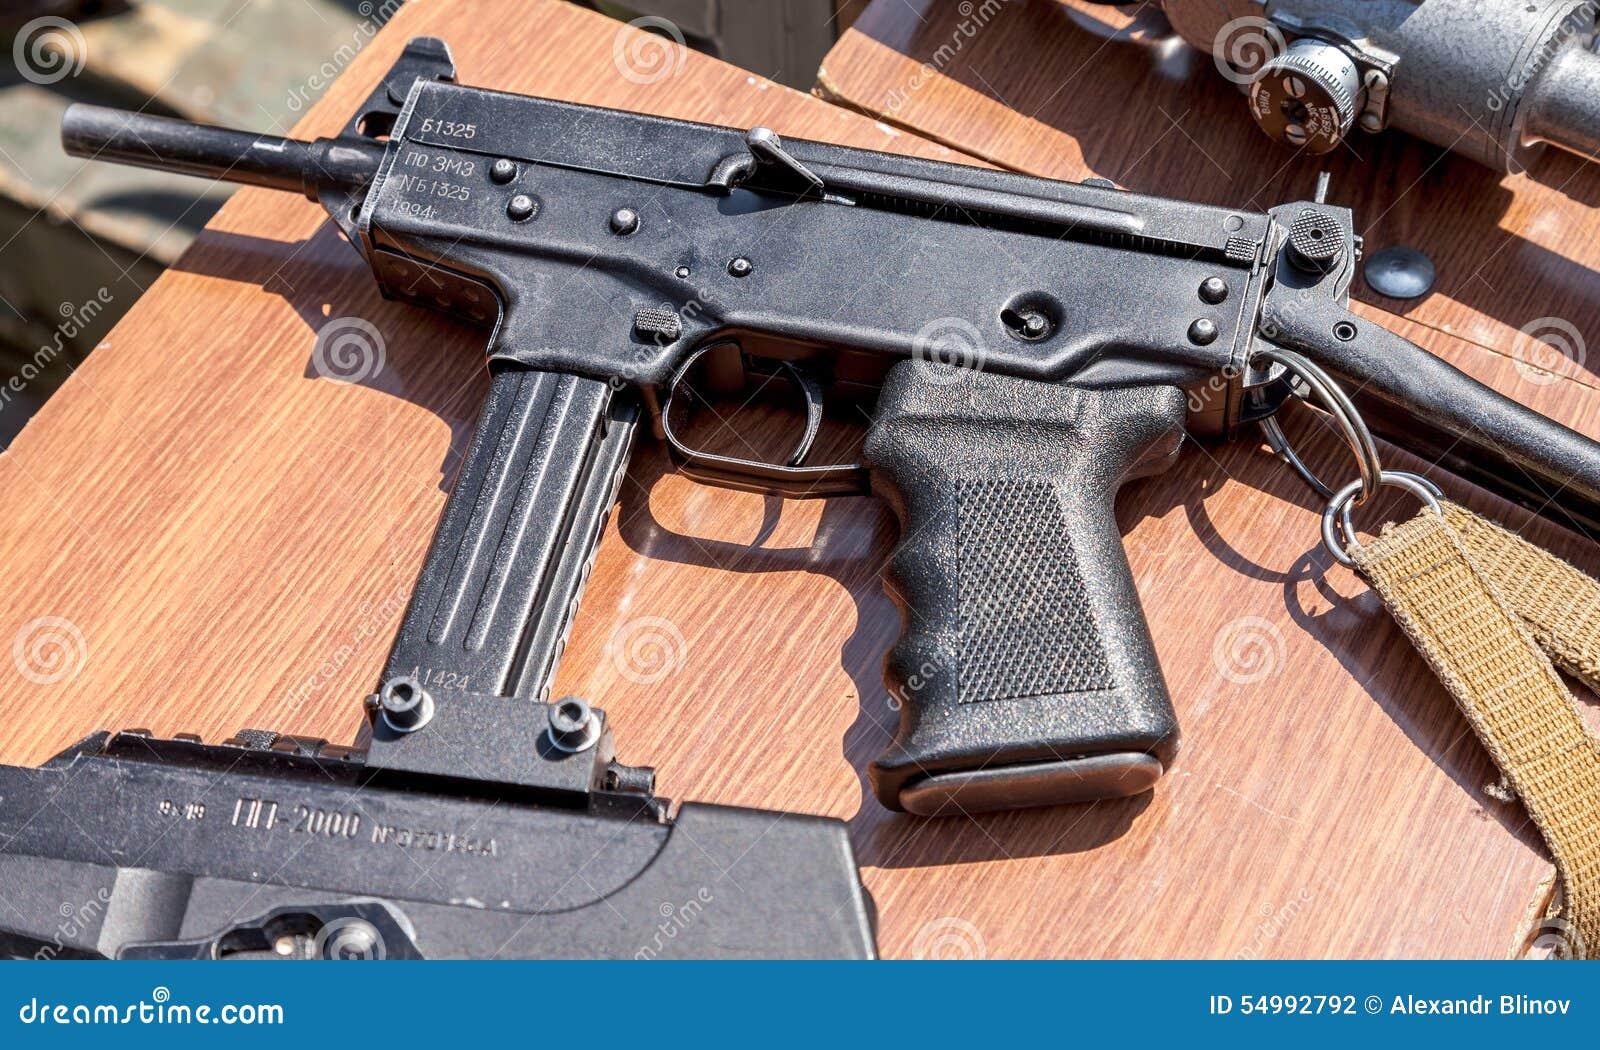 Alexandr pistoletov from russia to ukraine 7